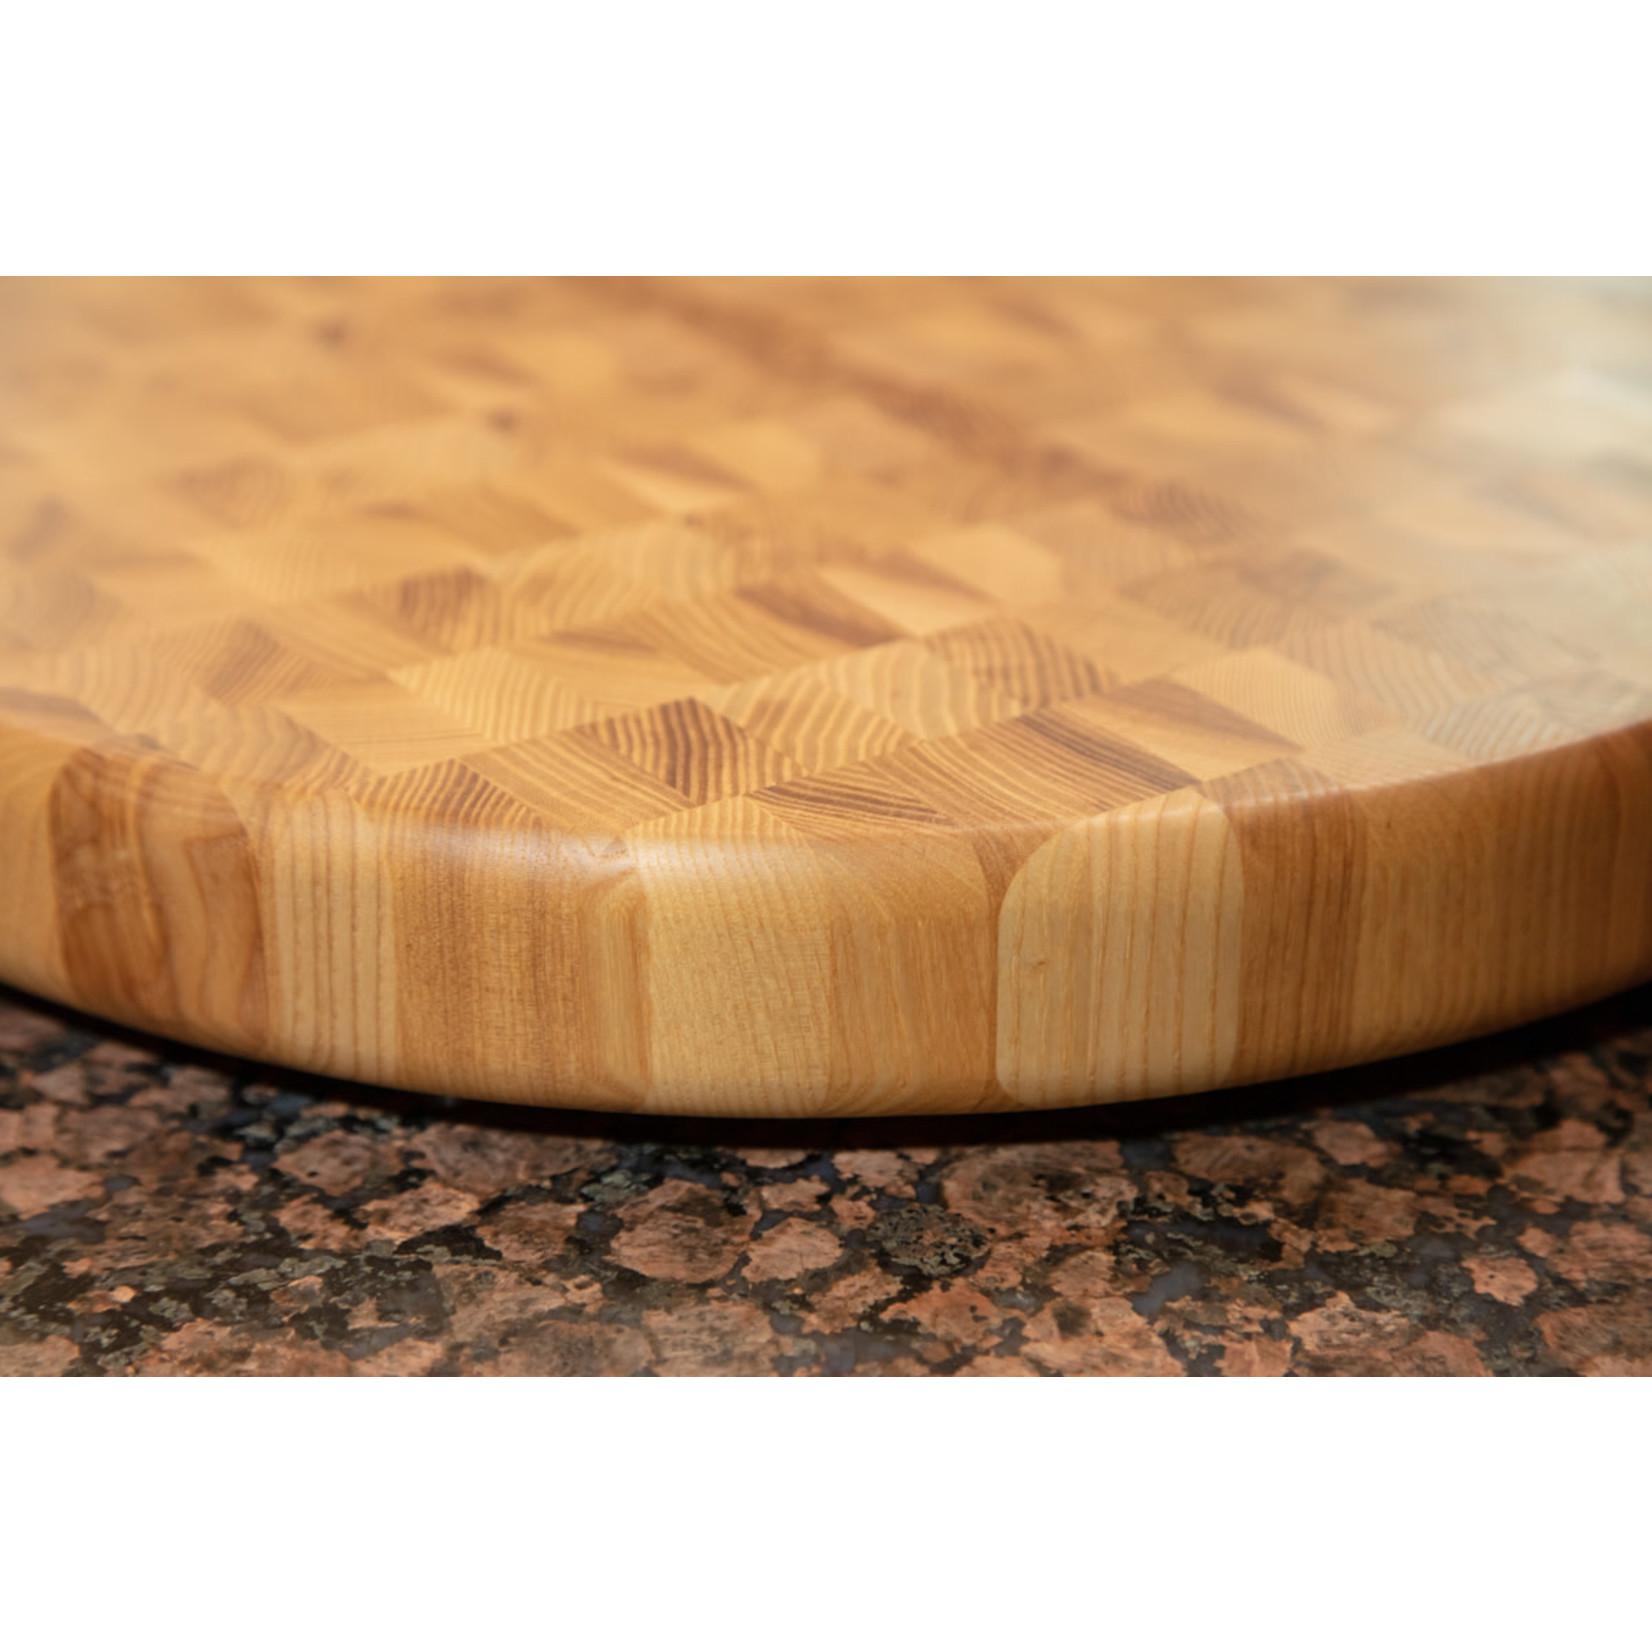 Richard Rose Culinary End Grain Round Cutting Board